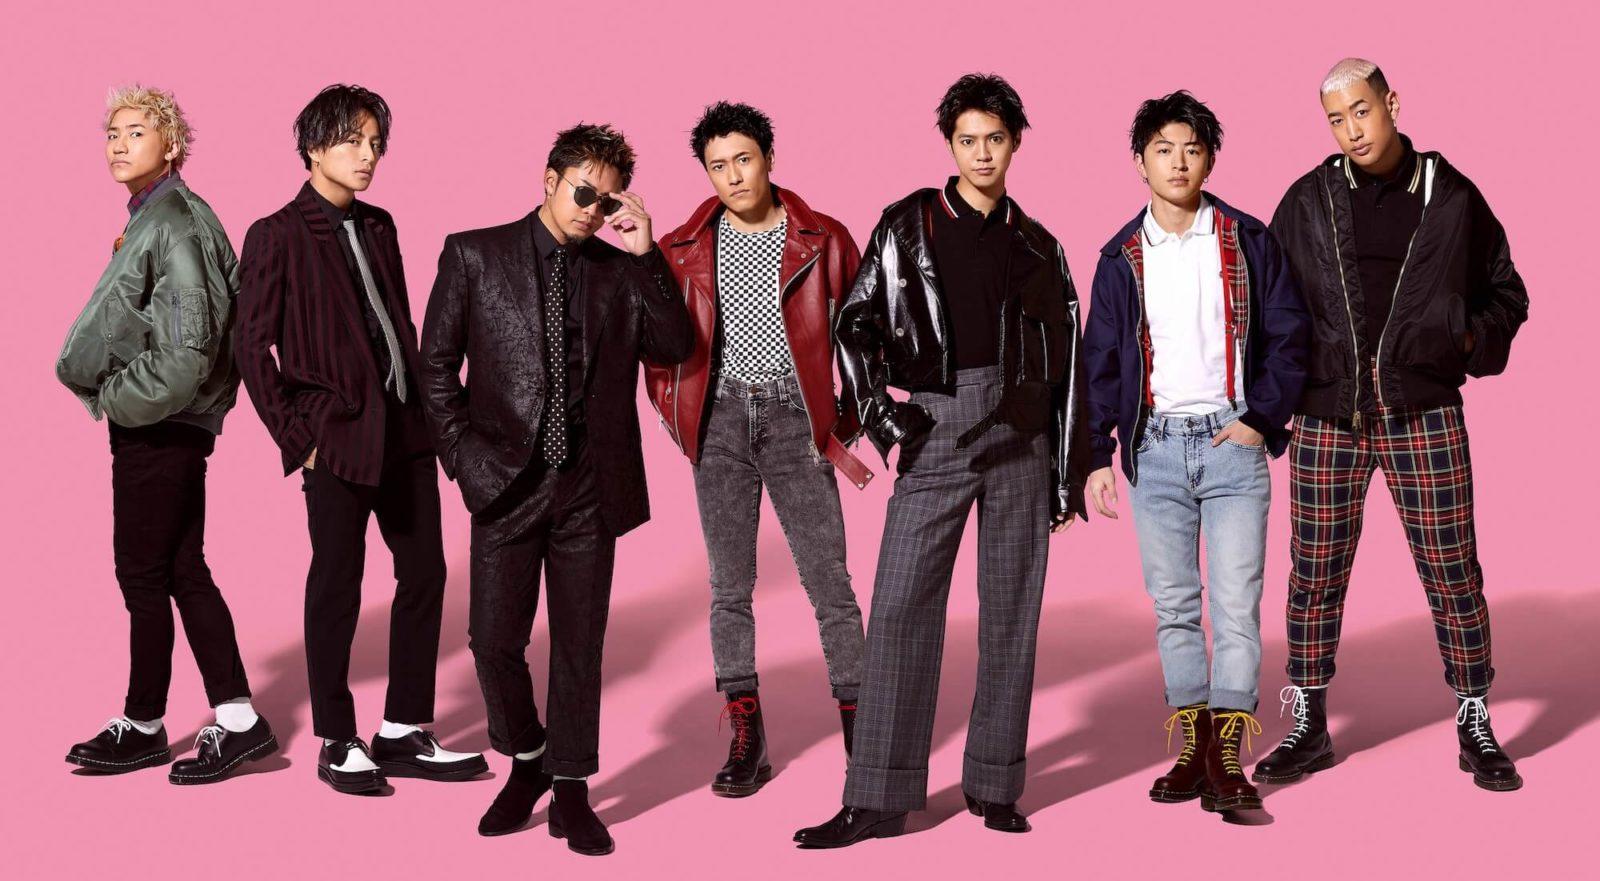 GENERATIONS from EXILE TRIBEの新曲も初登場!今注目の歌詞ランキング1位はEnGene.の「五次元チャペル」サムネイル画像!